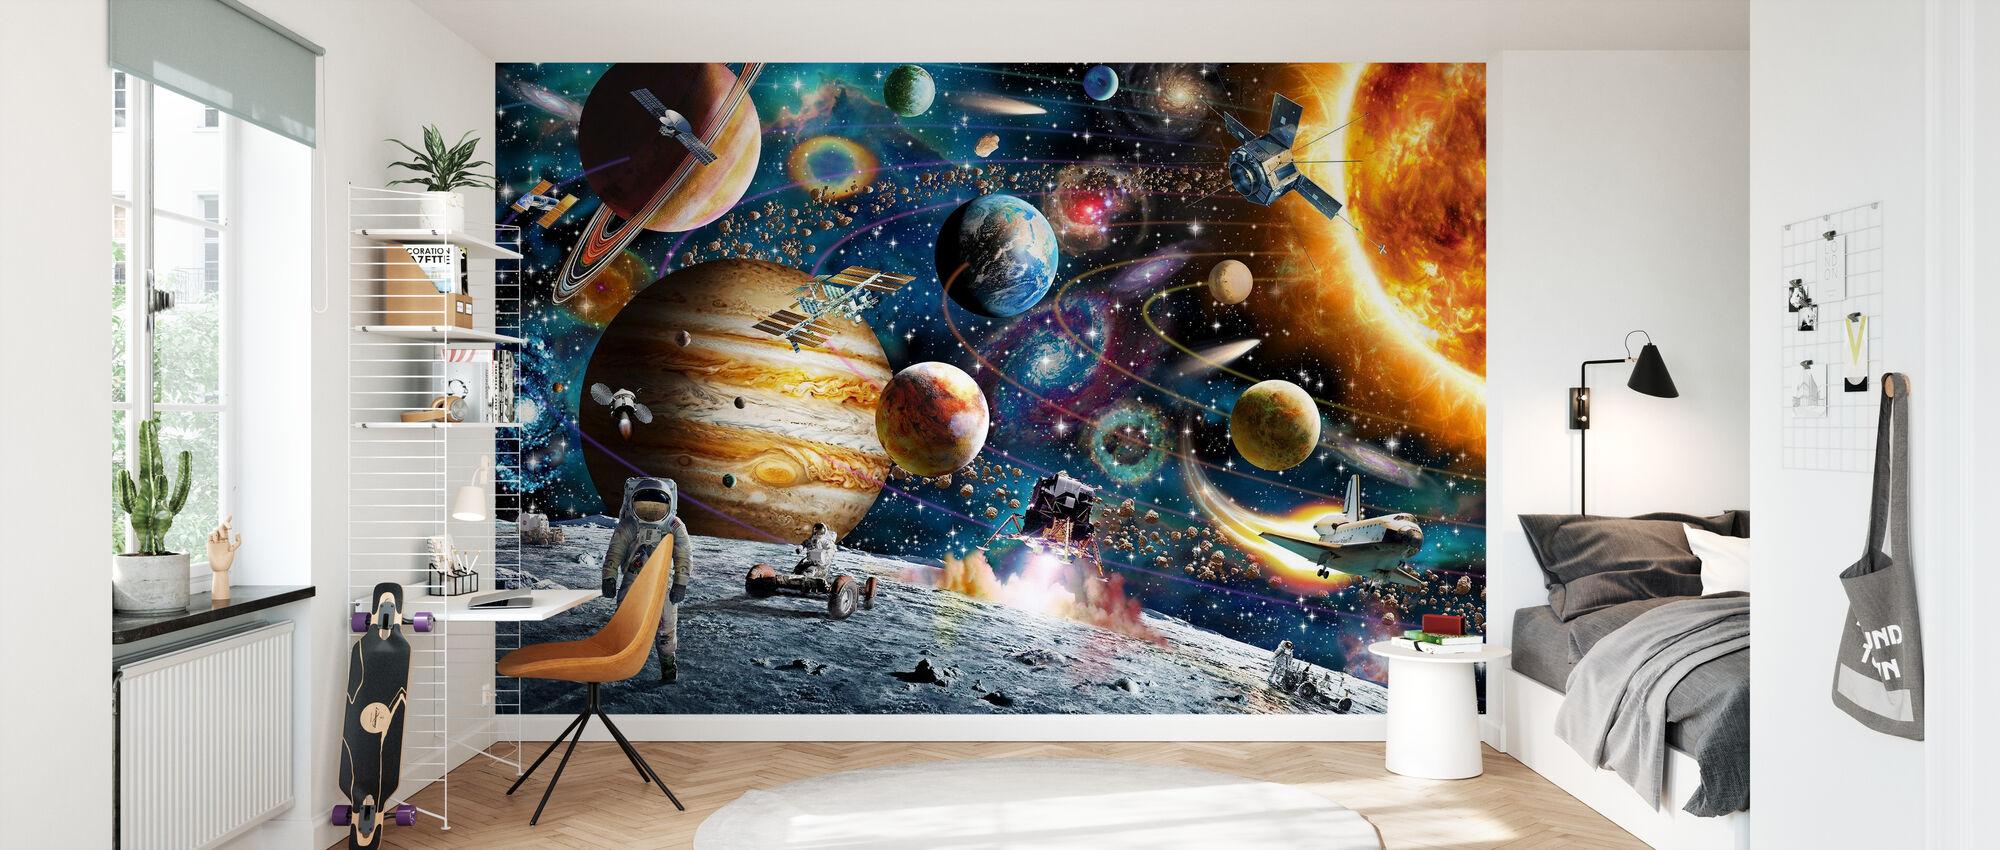 Space Odyssey - Wallpaper - Kids Room